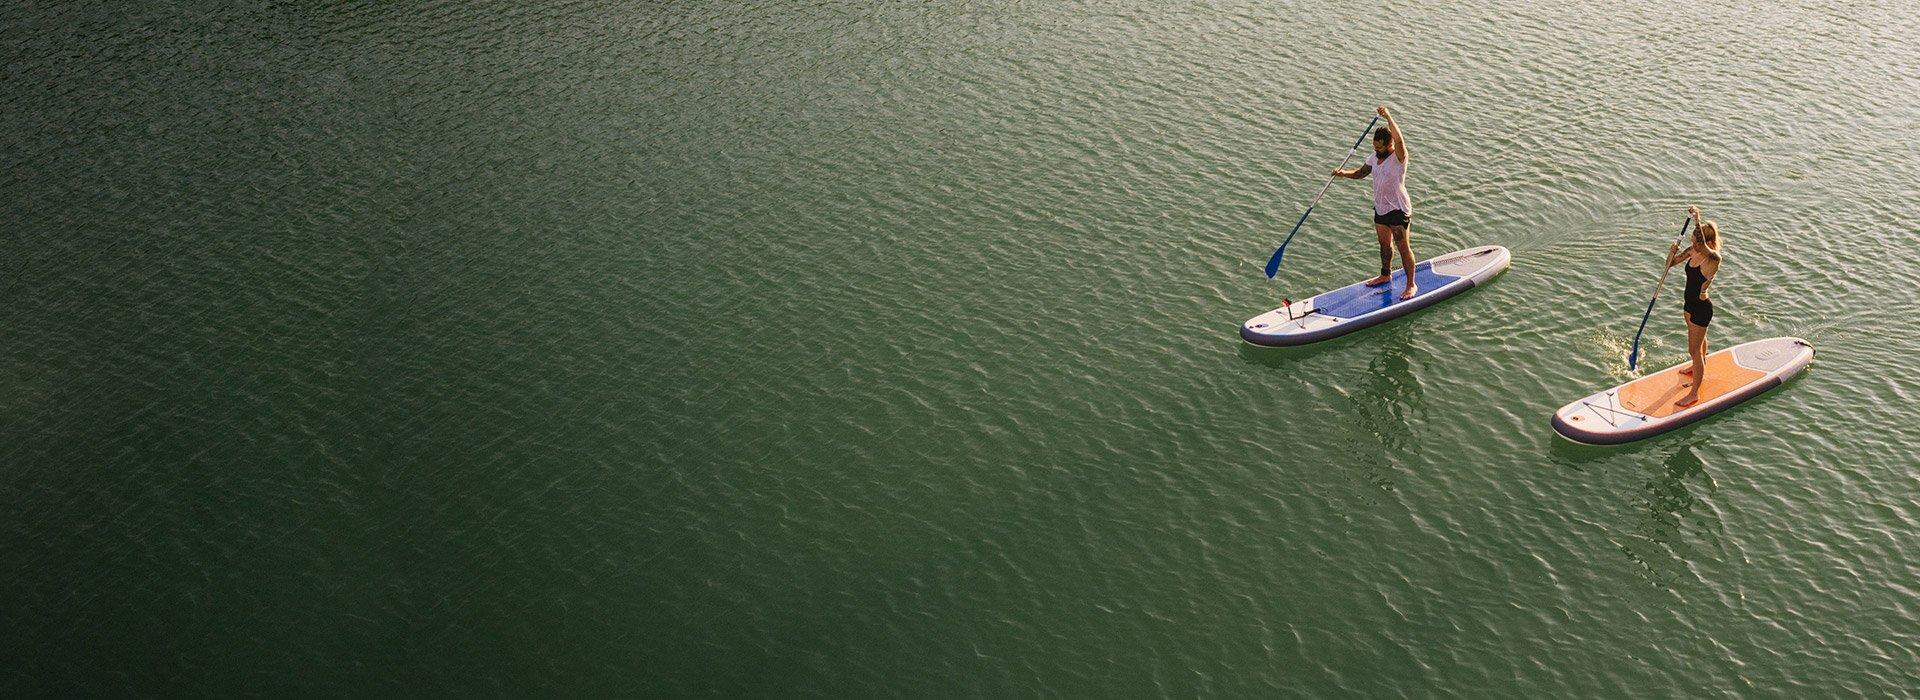 С веслом вокруг света